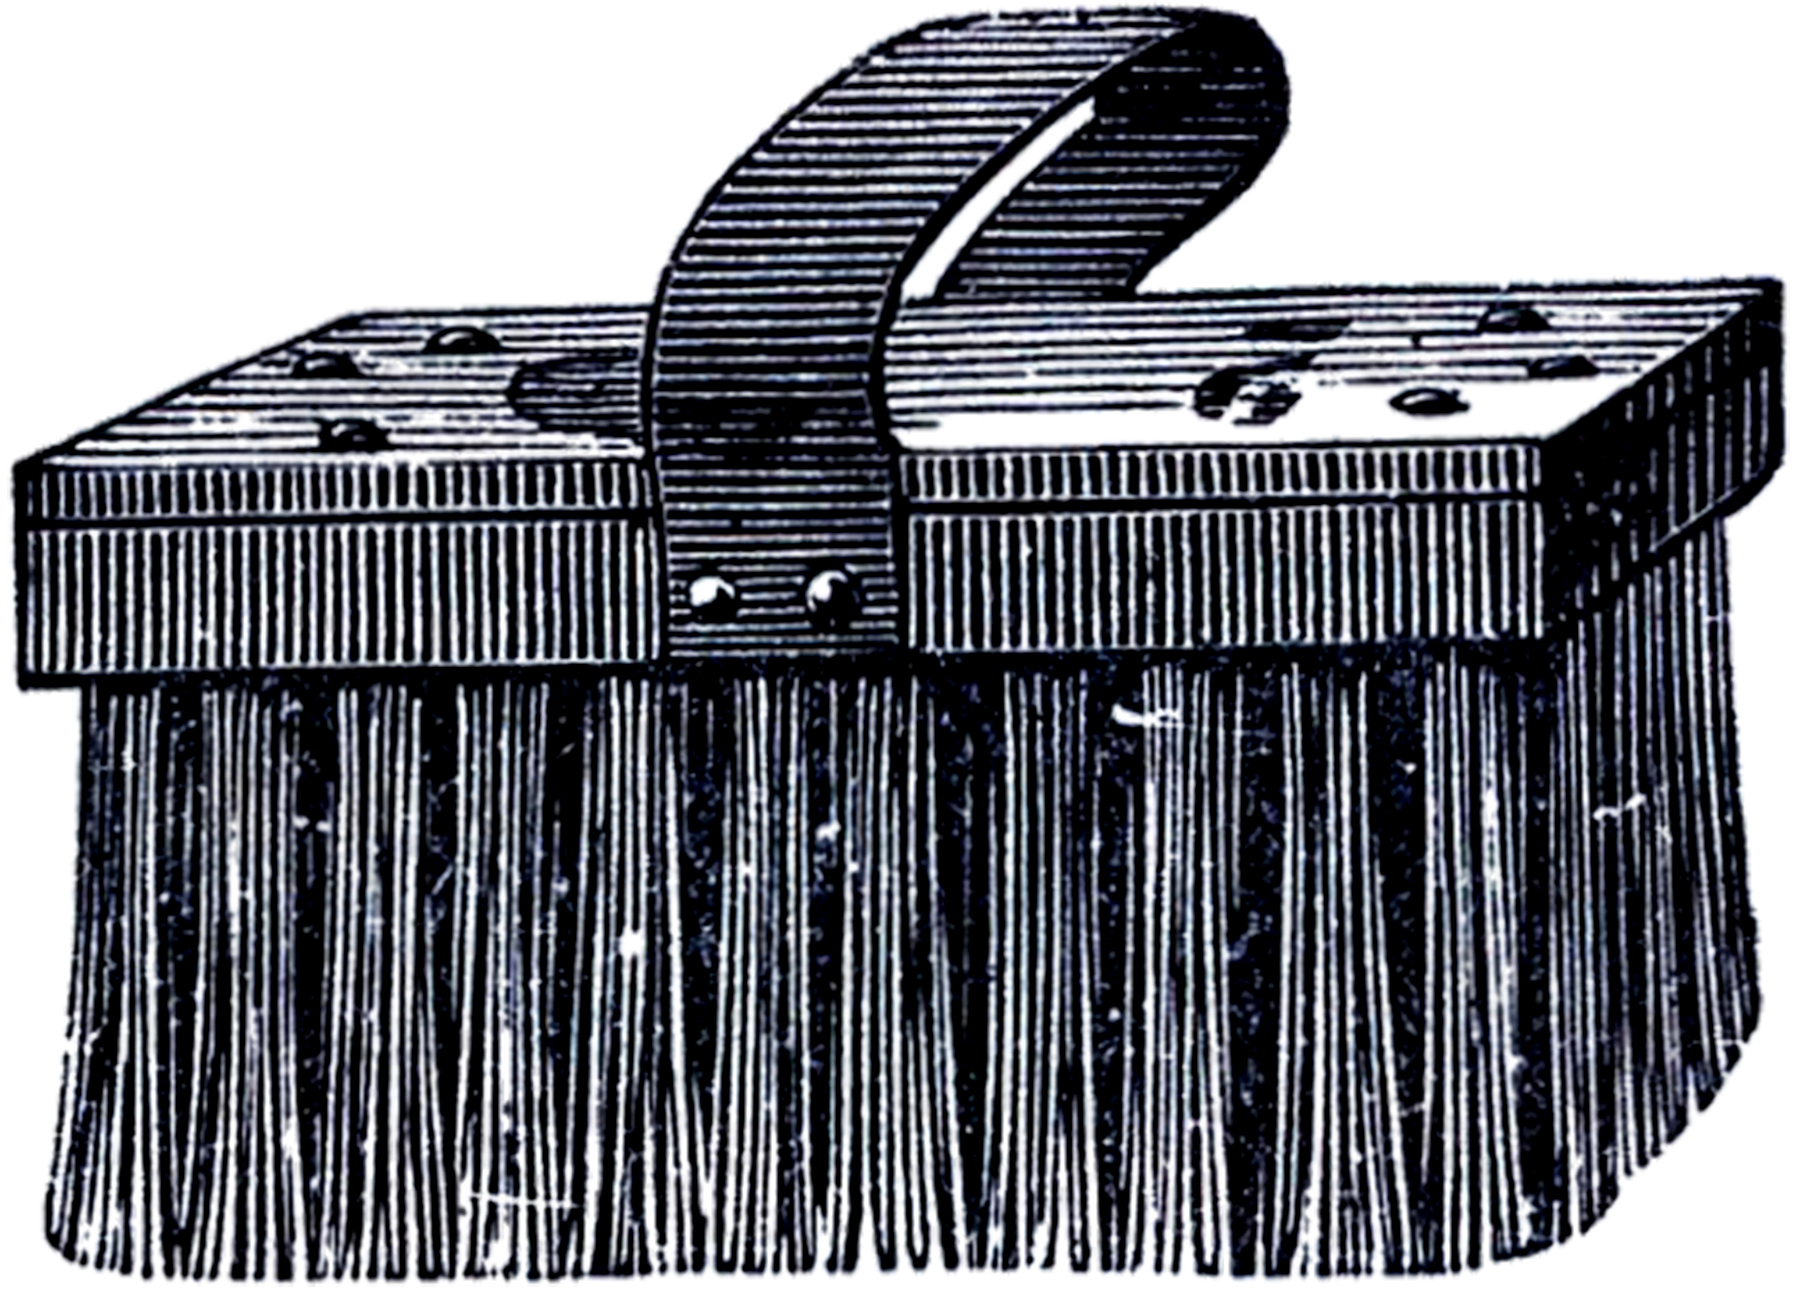 Vintage Scrub Brush Clip Art.